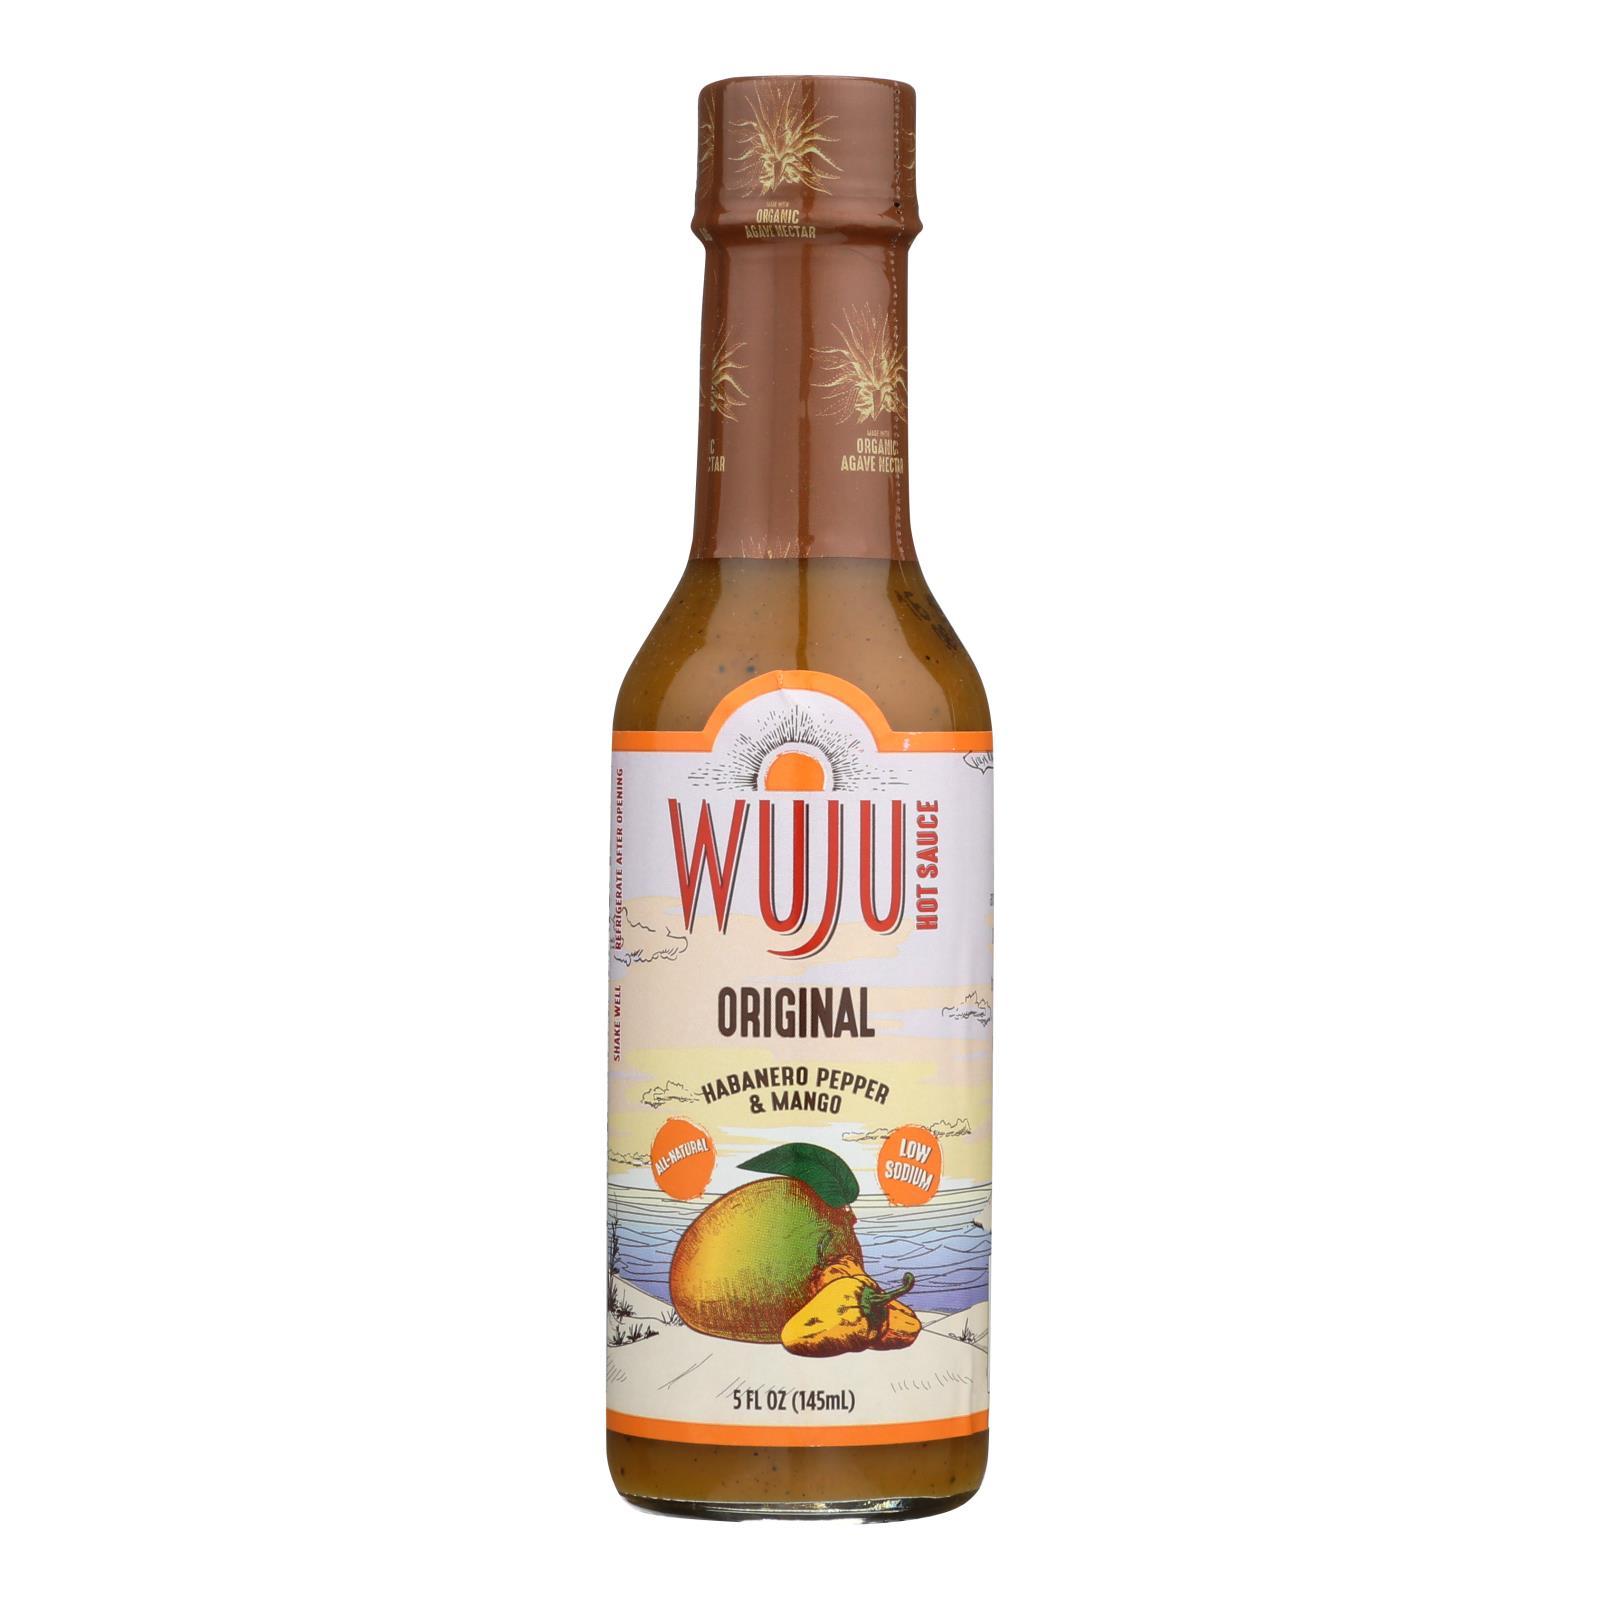 Wuju Hot Sauce - Original - Case of 6 - 5 oz.